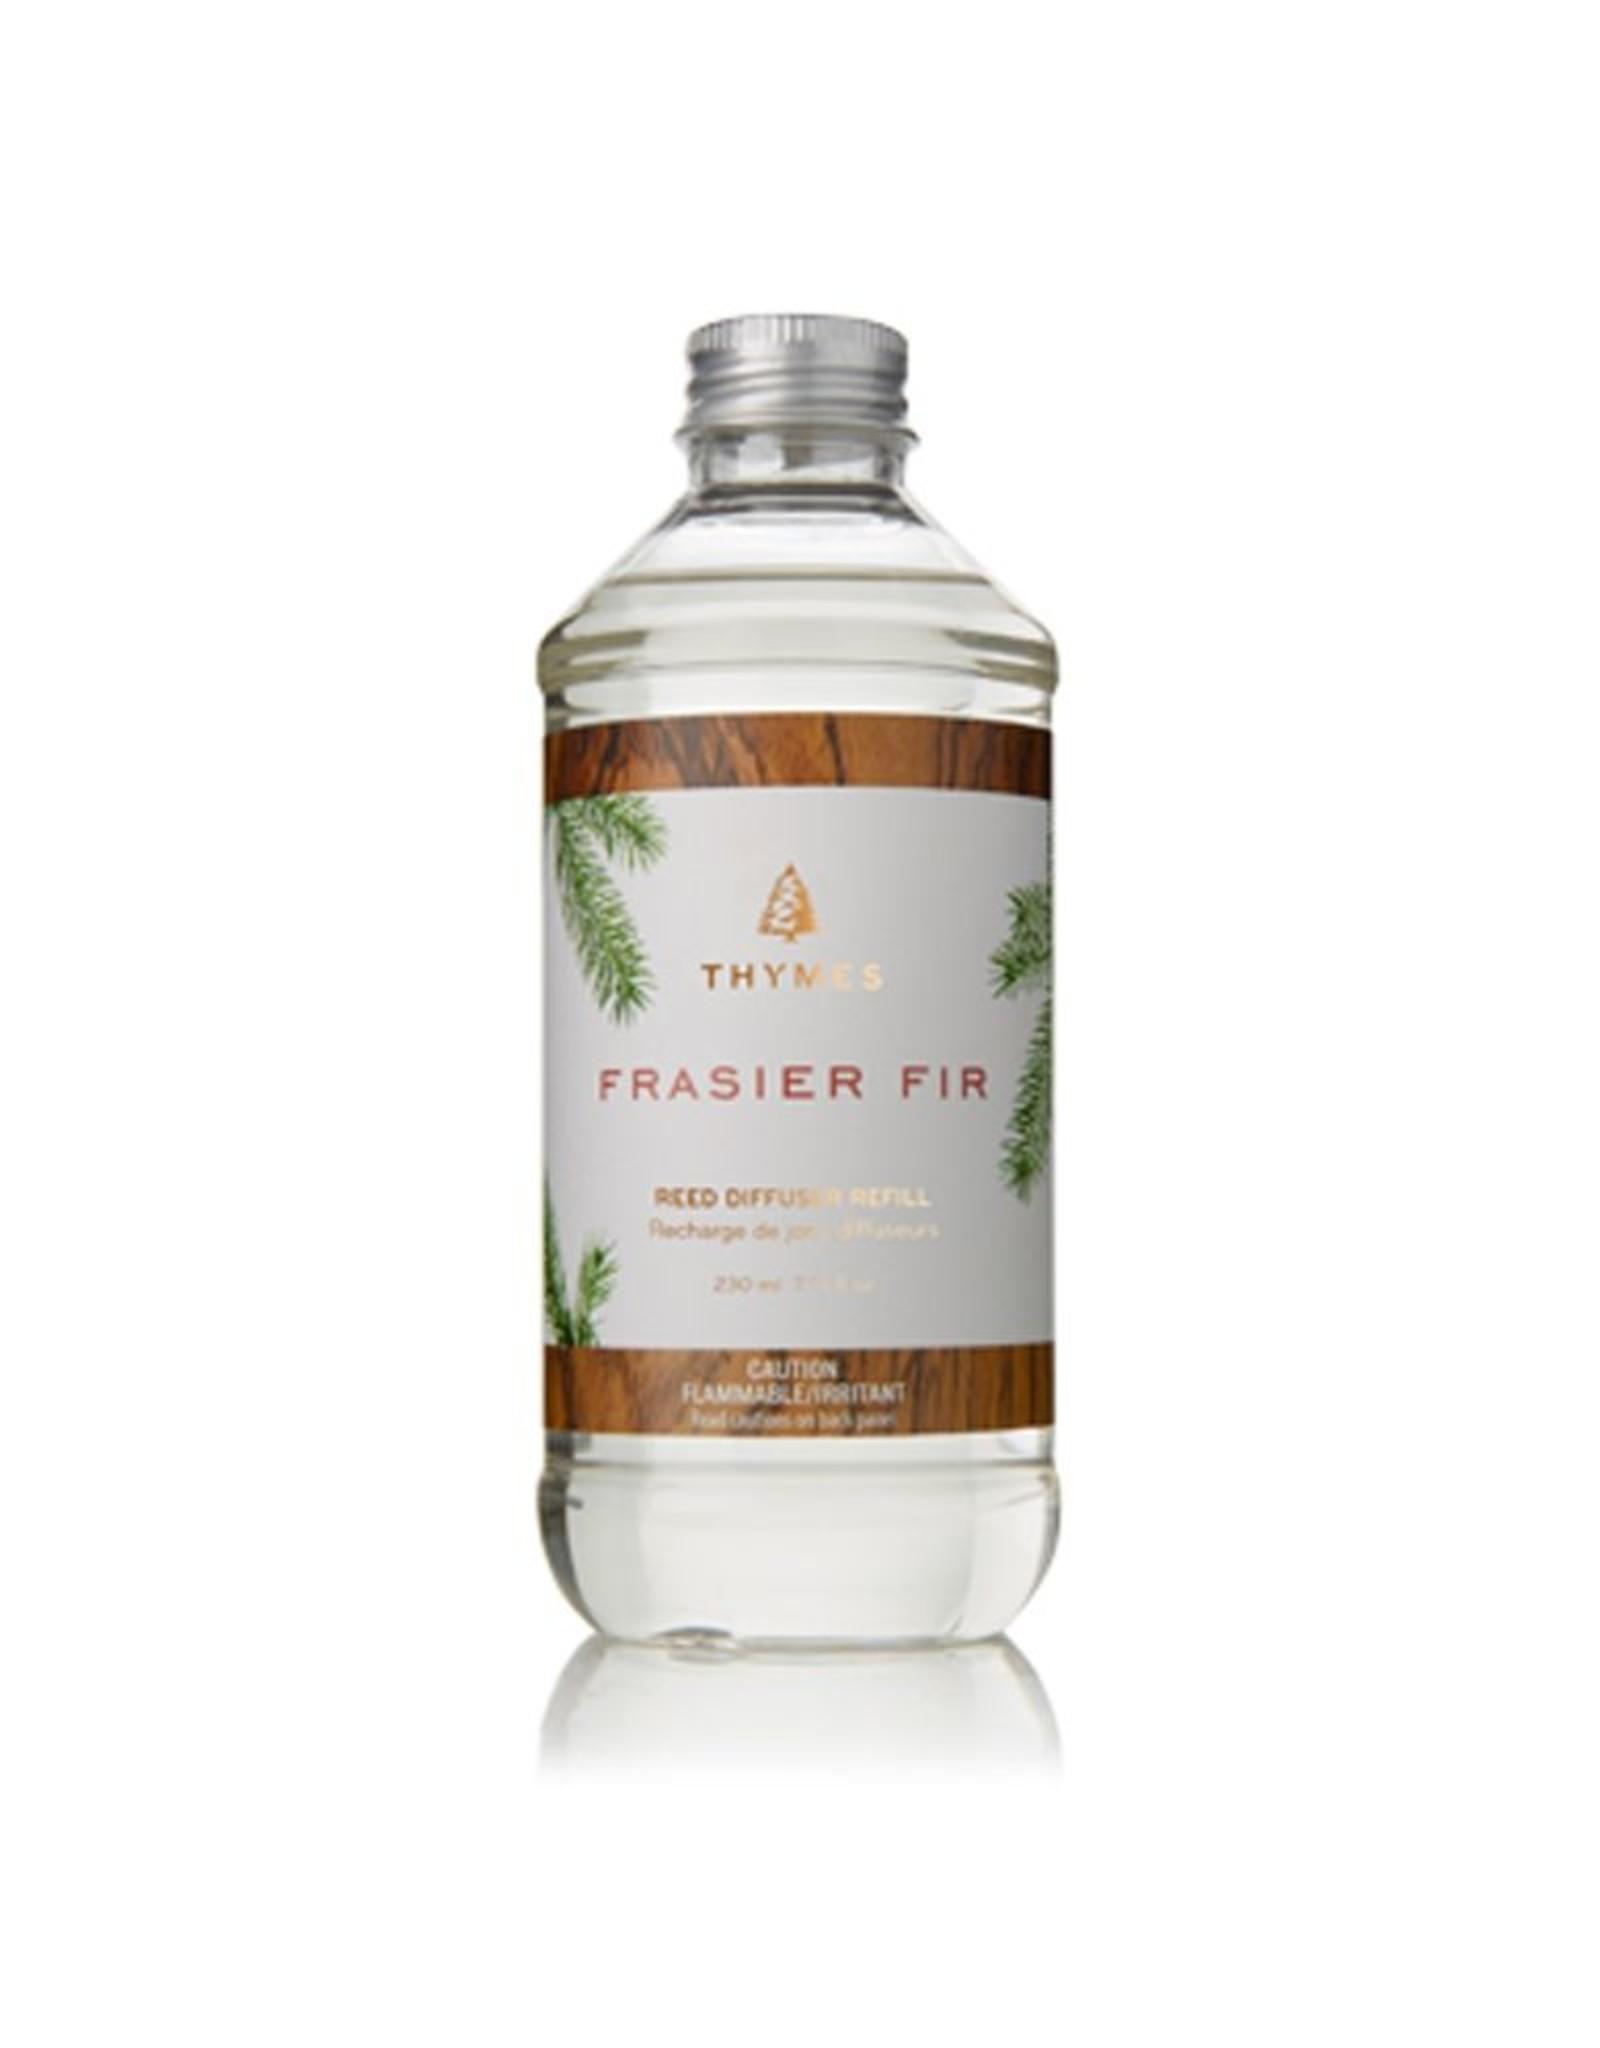 Thymes Frasier Fir Diffuser Oil Refill, 230ml